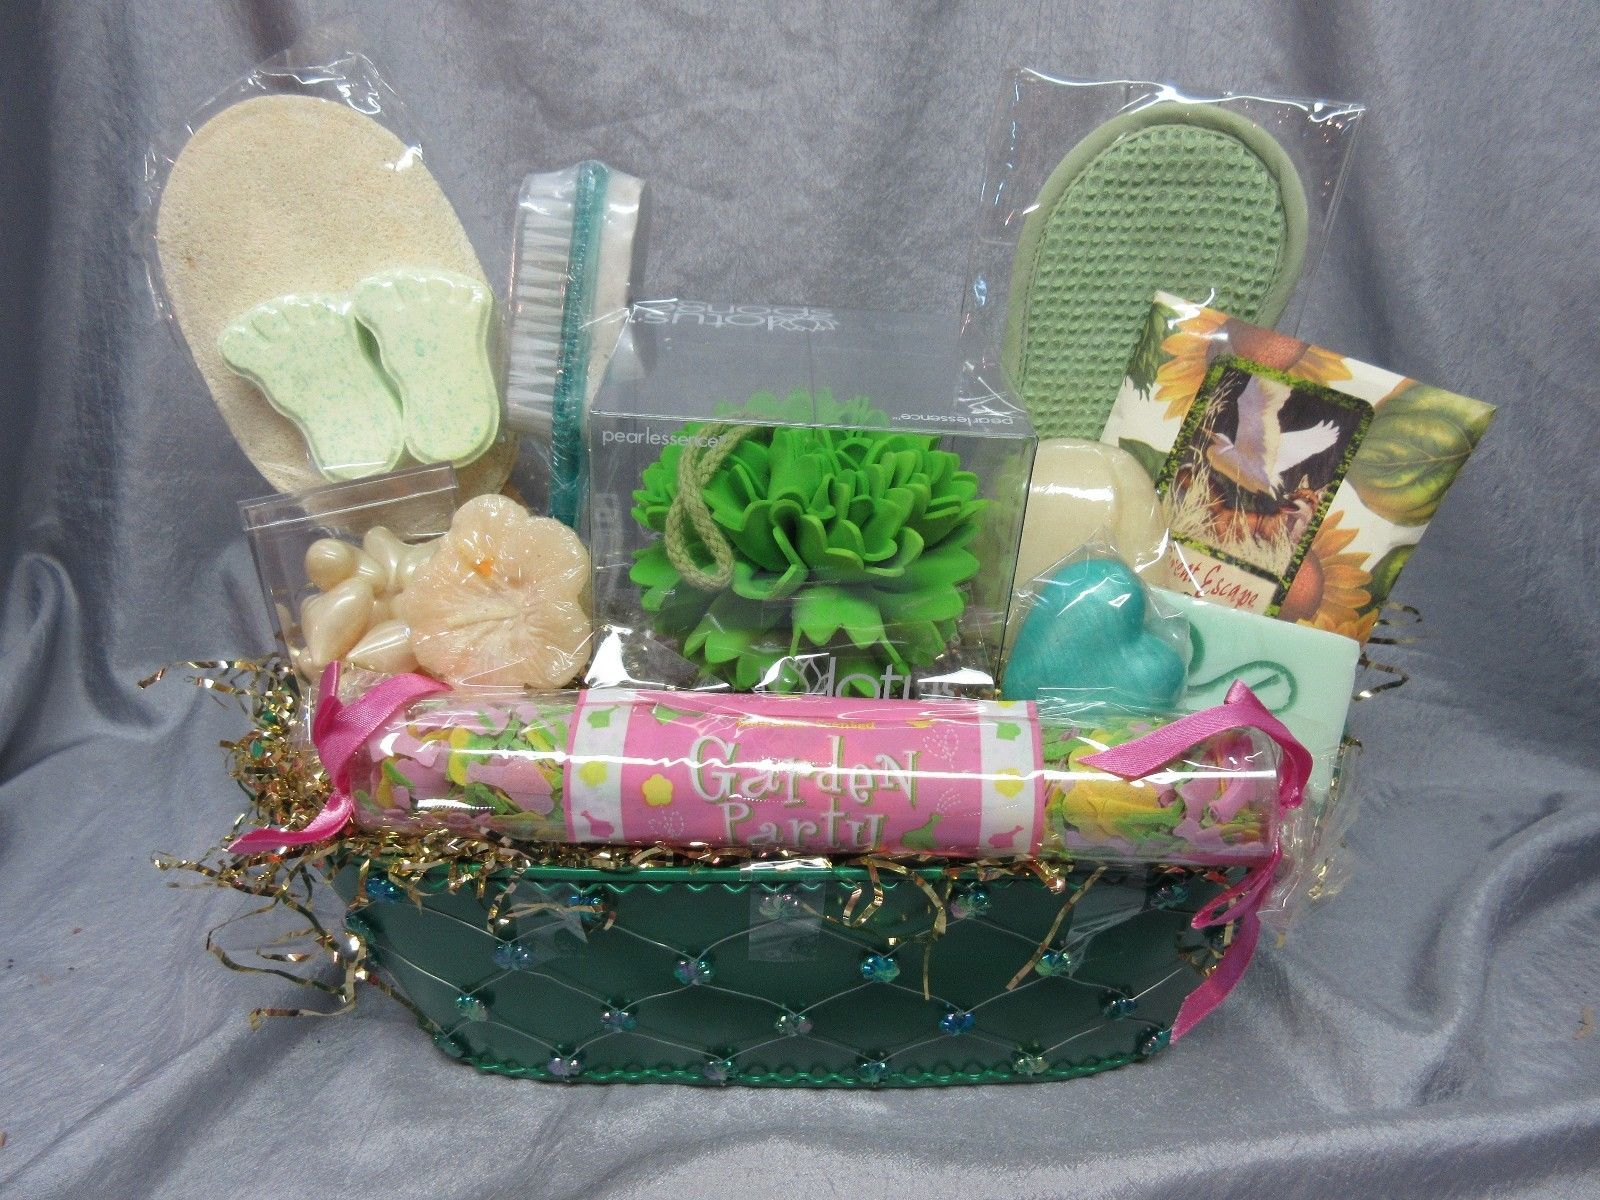 Candle Gift Baskets  Shop Candle Gift Baskets Online